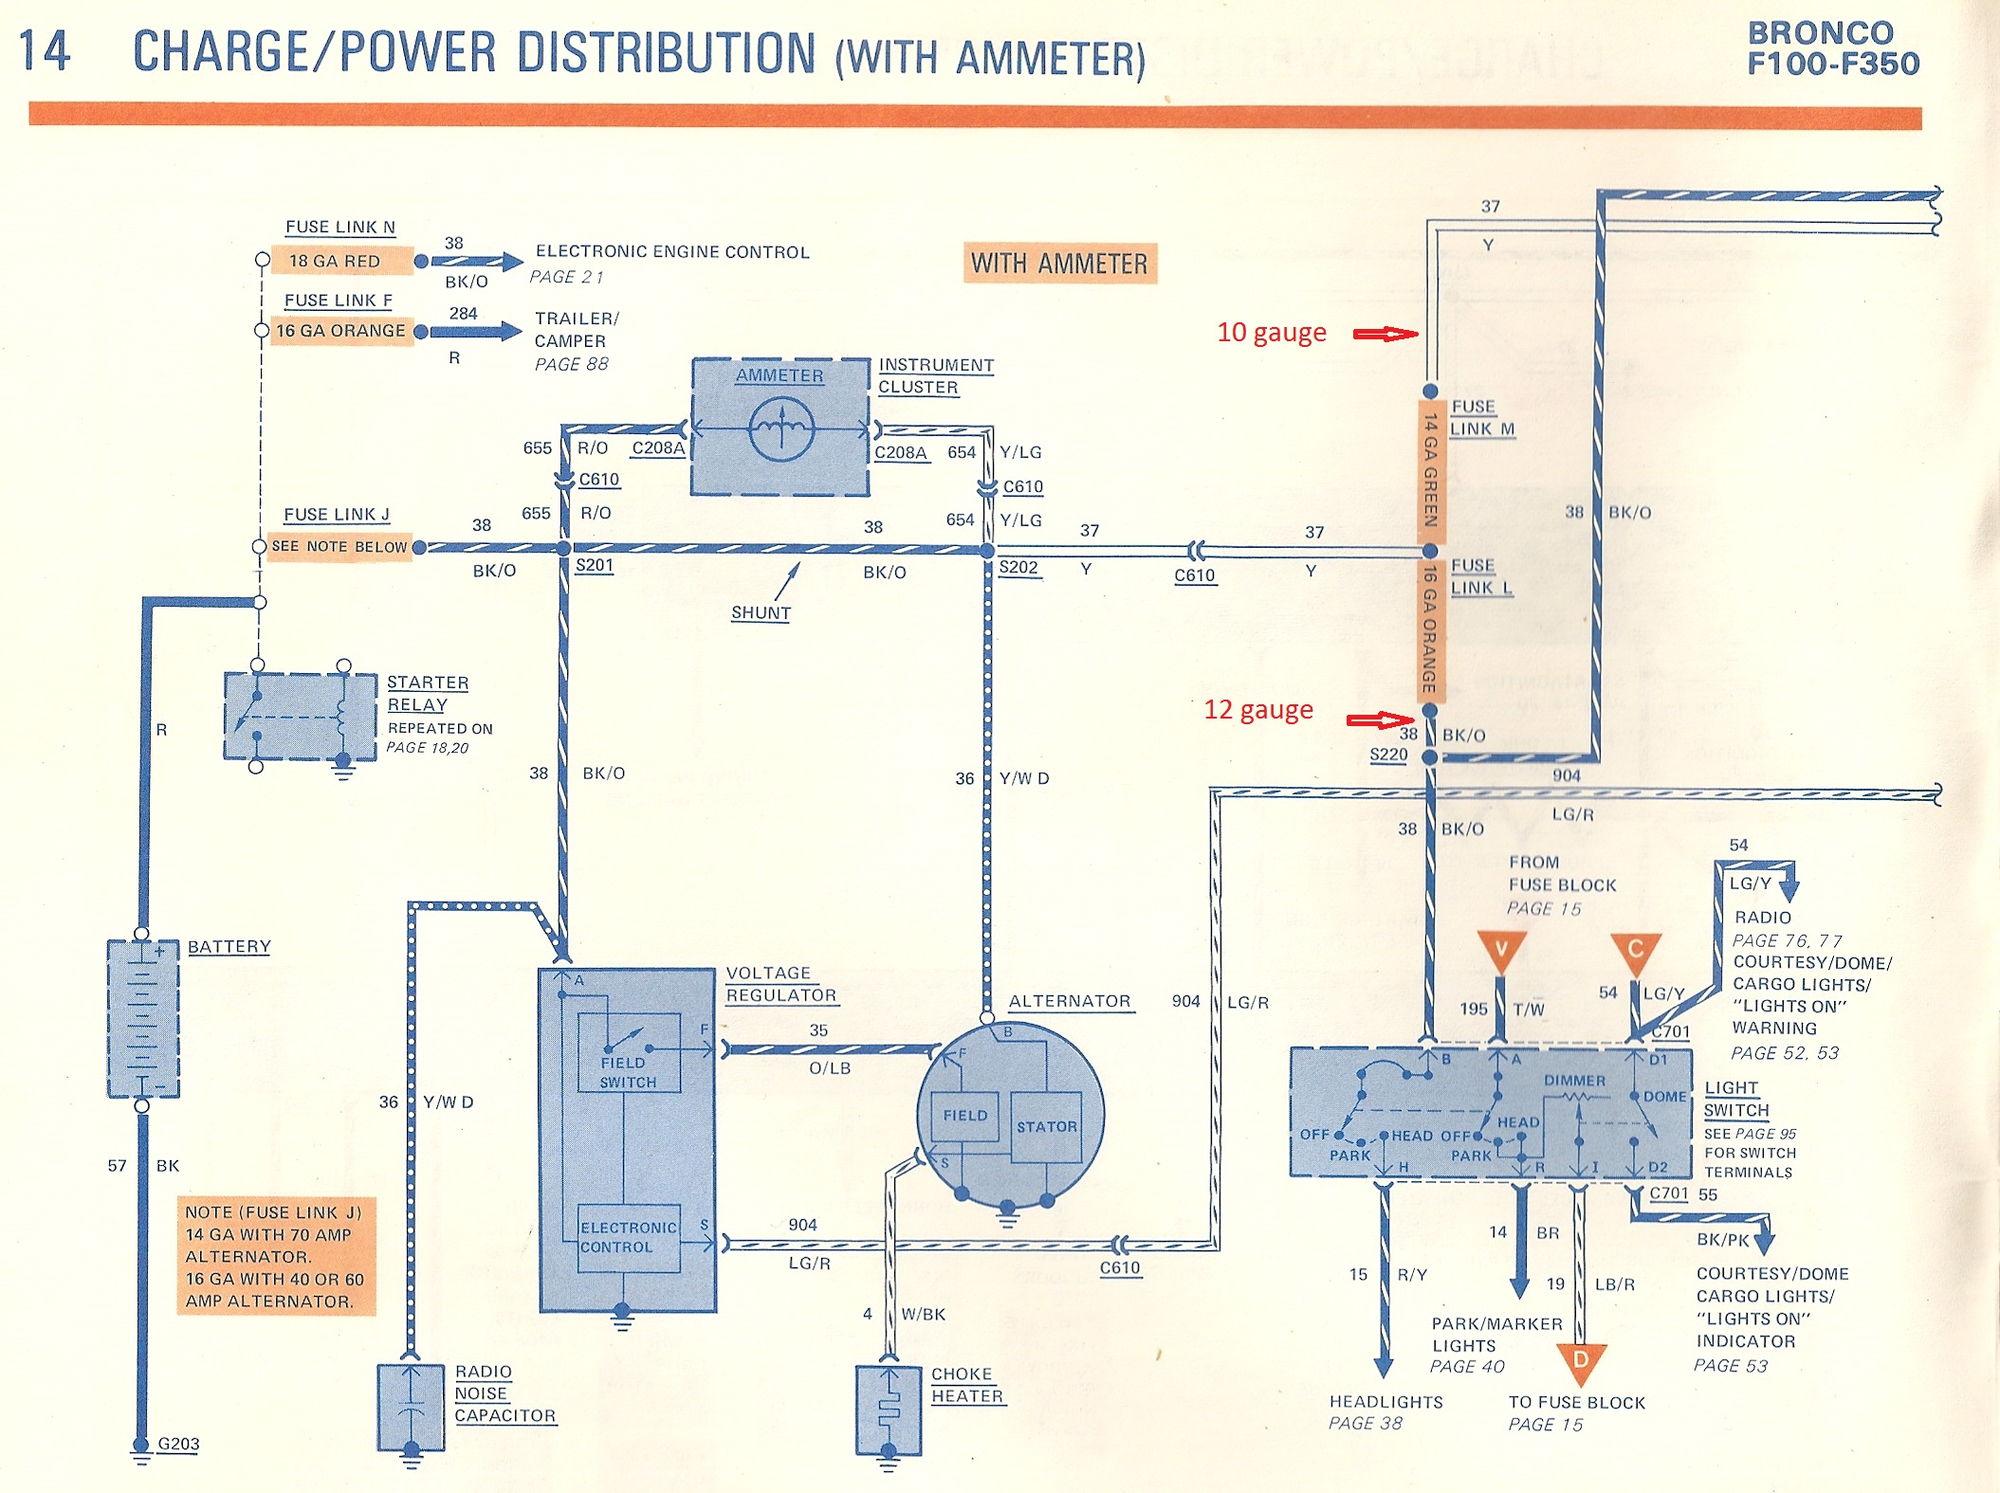 Bronco Alternator Wiring Diagram on dodge alternator wiring, custom alternator wiring, cj5 alternator wiring, jeep alternator wiring, chevrolet alternator wiring, cherokee alternator wiring, taurus alternator wiring, f150 alternator wiring, ford alternator wiring, pinto alternator wiring, f100 alternator wiring, mustang alternator wiring, torino alternator wiring, bobcat alternator wiring, delta alternator wiring, f350 alternator wiring, grand marquis alternator wiring, honda alternator wiring, model t alternator wiring, toyota alternator wiring,